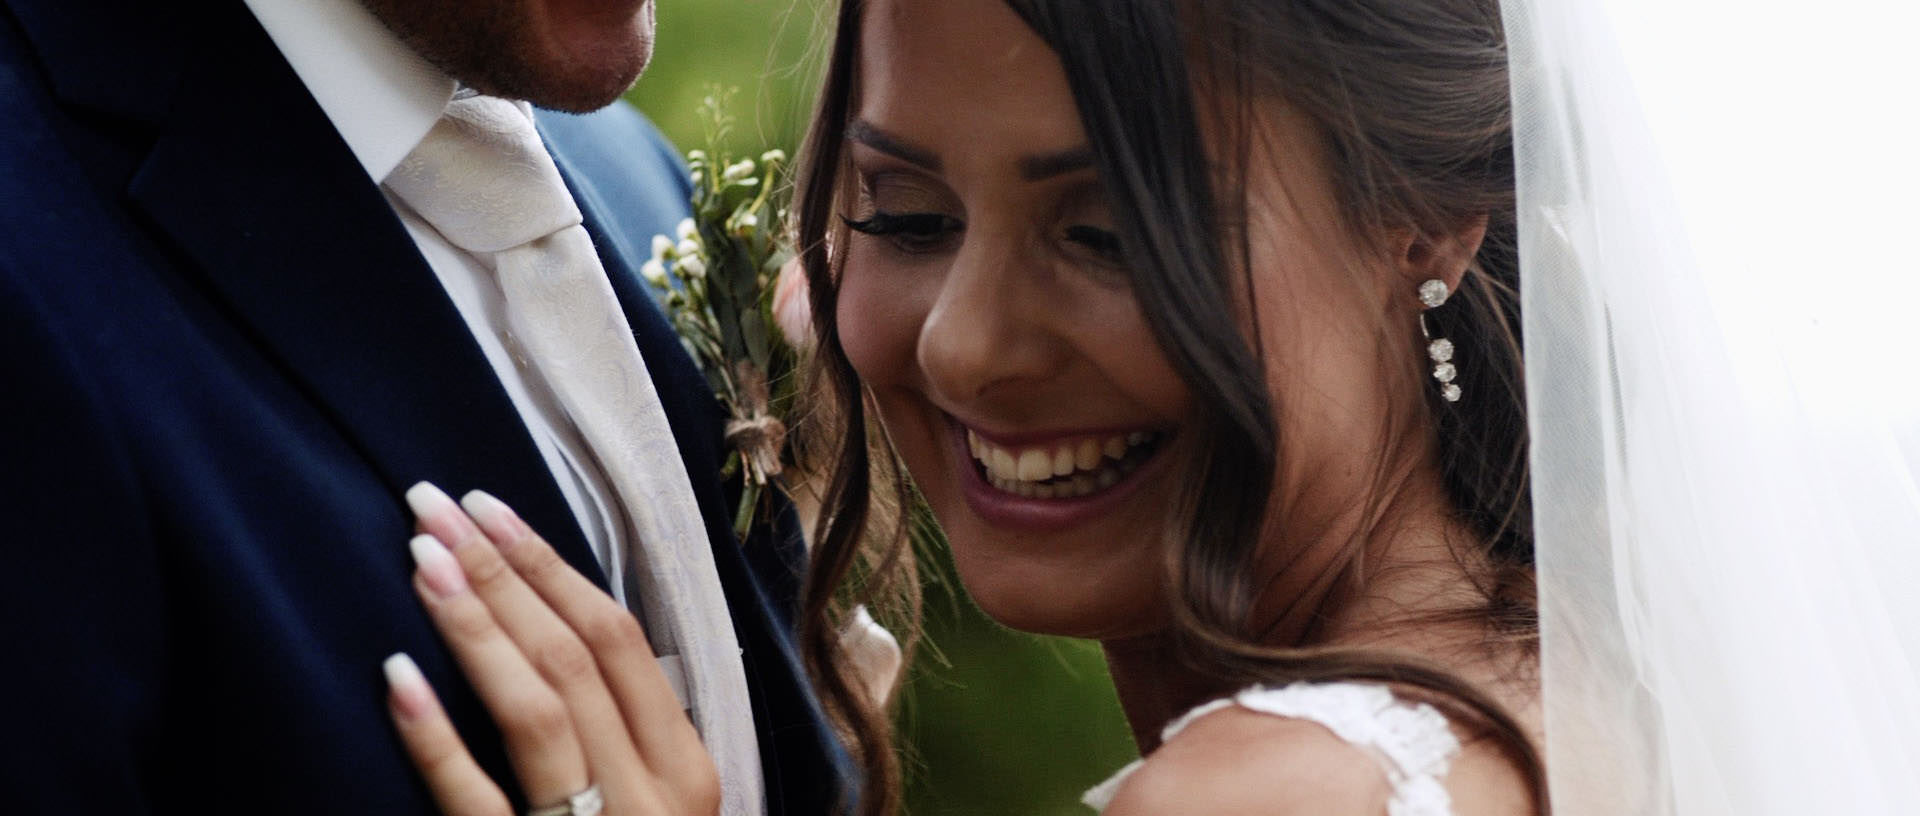 Hyde Barn Colswolds Wedding Verity-Jade & Kai 29 Cropped.jpg